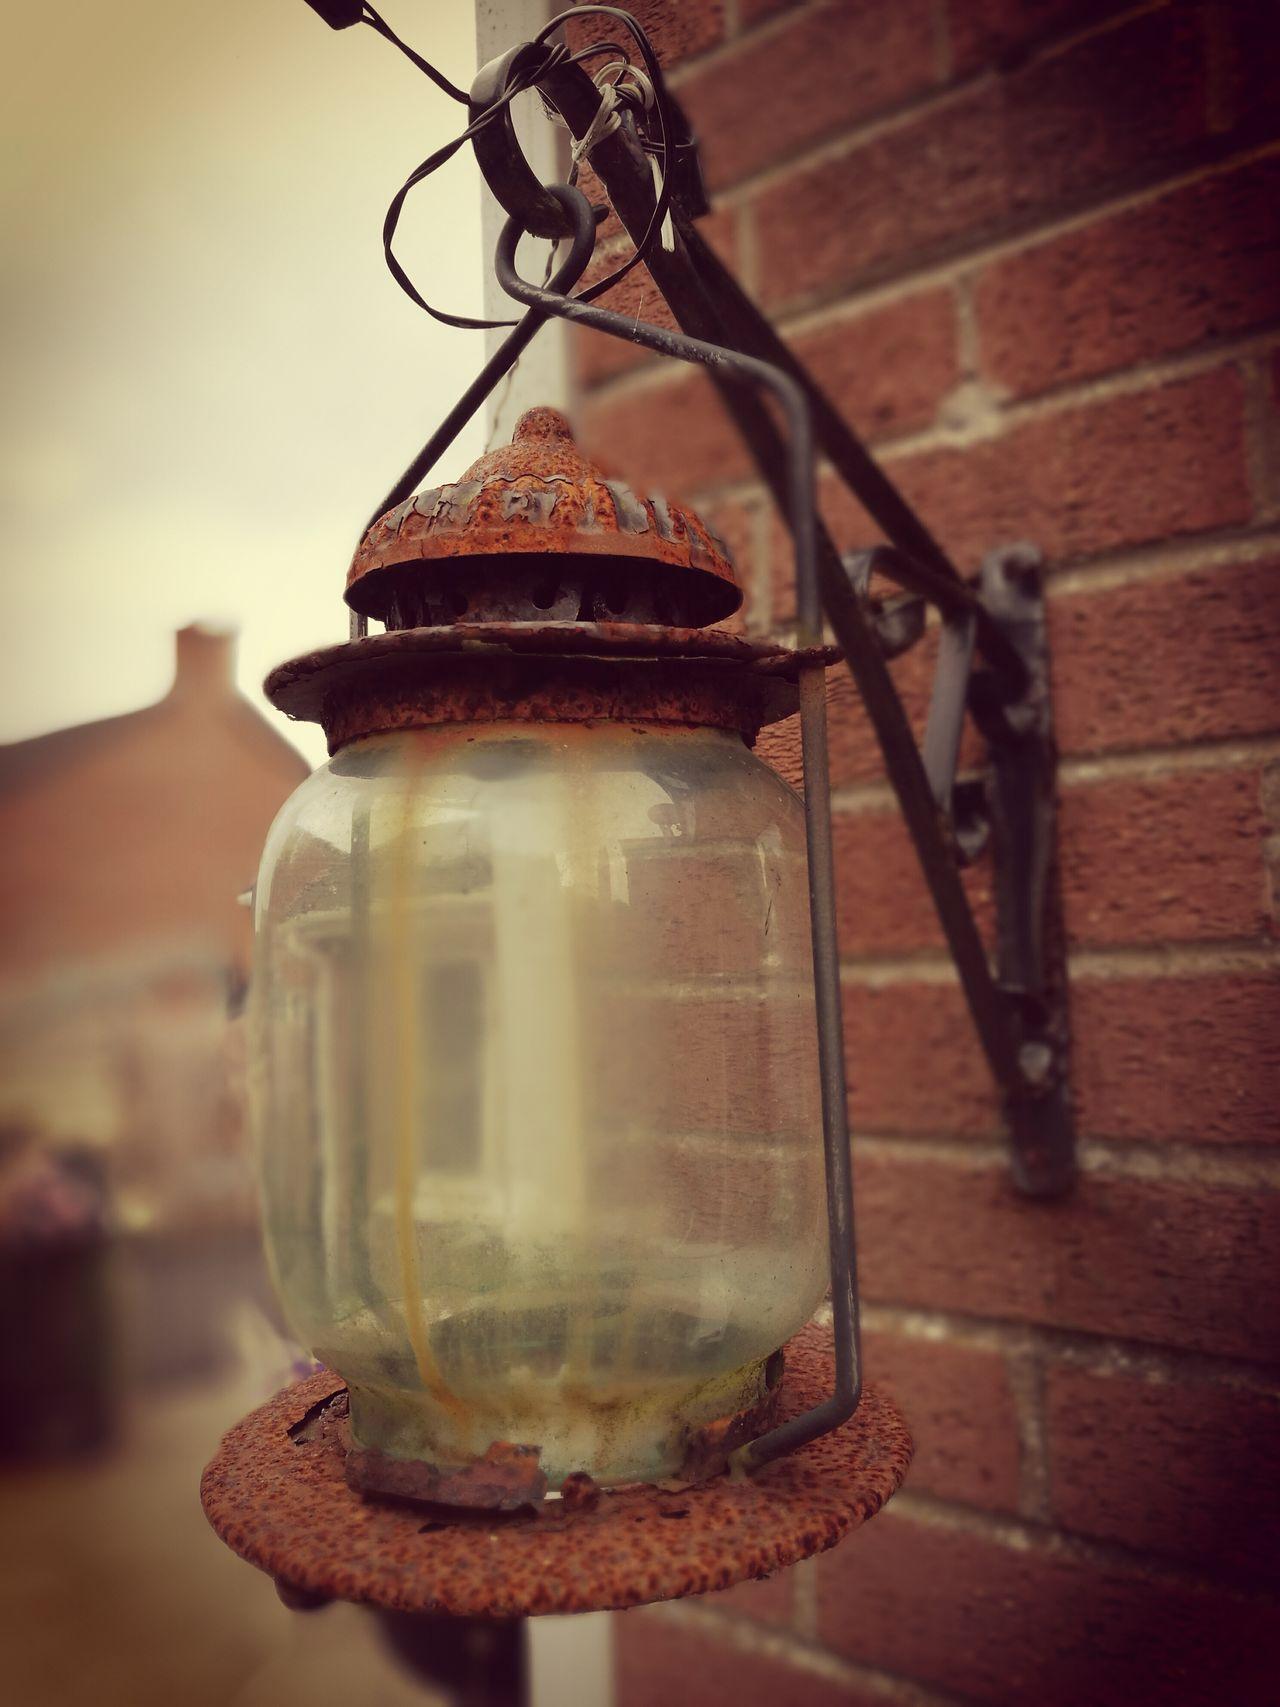 Rusty Lantern Rusty Lantern Glass Old Vintage